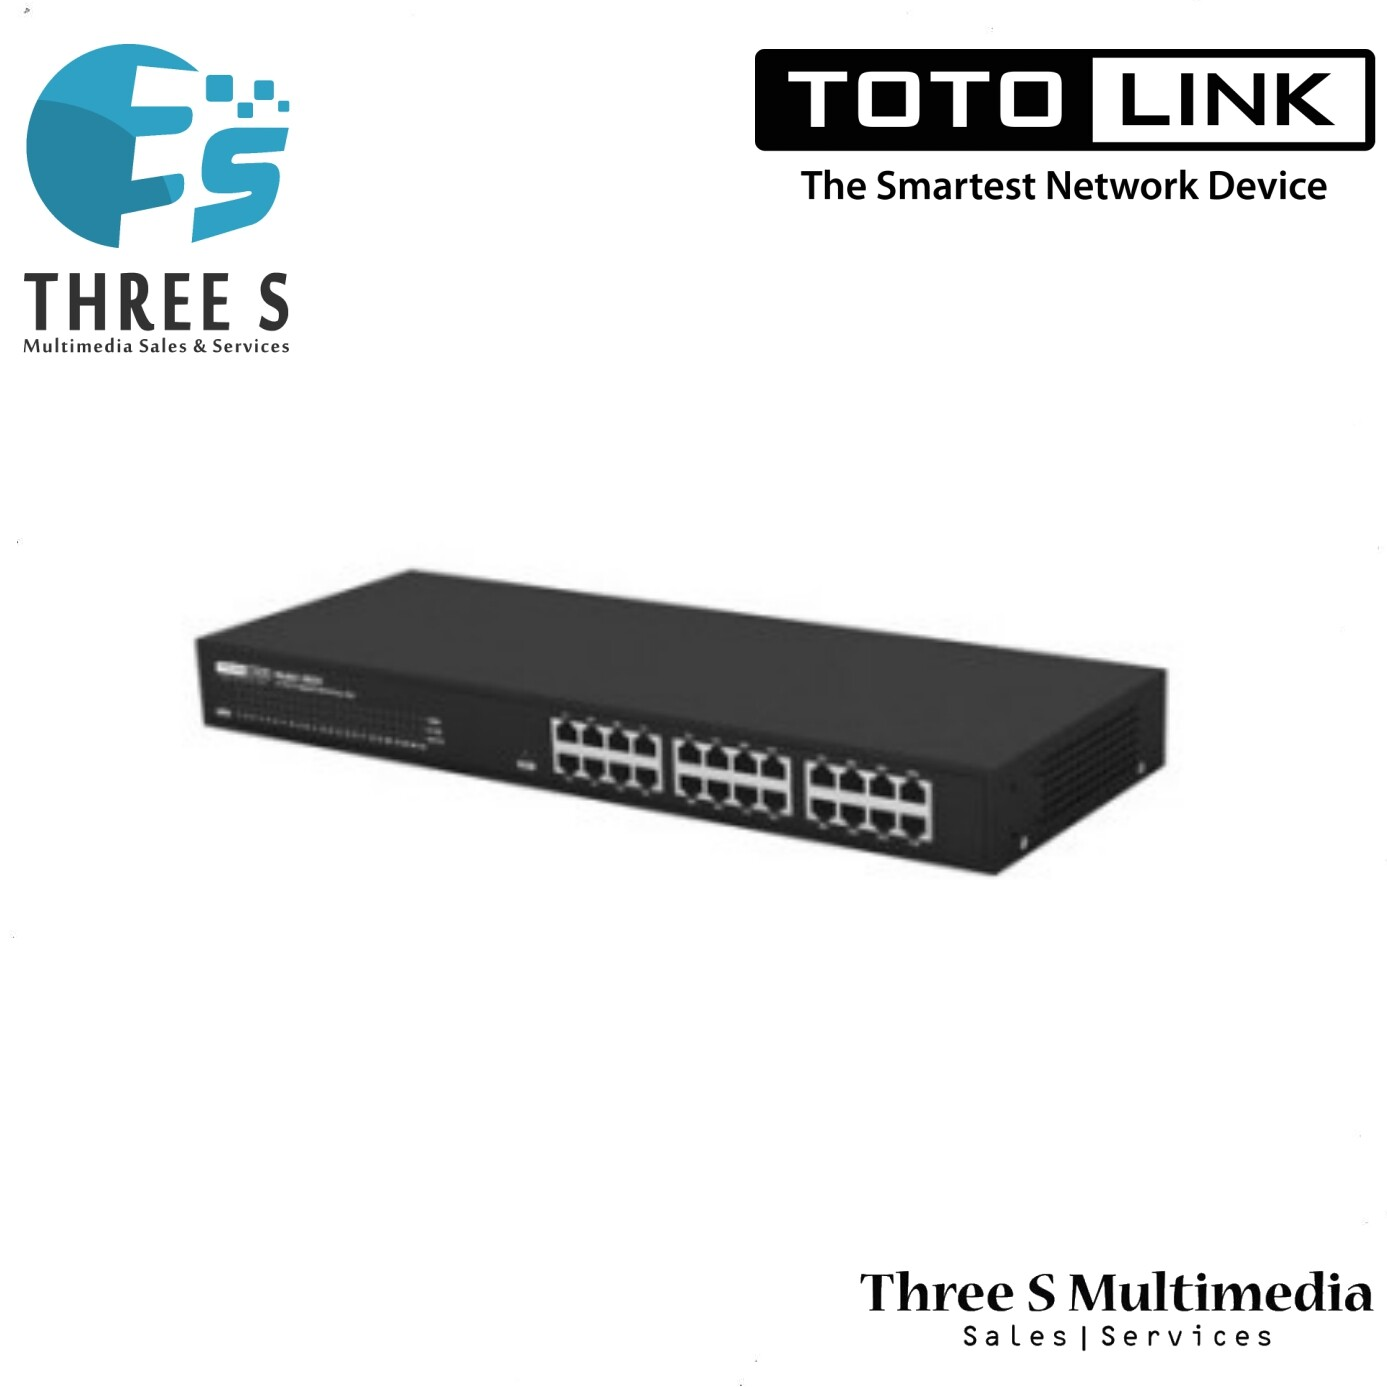 TOTO LINK 24-Port Gigabit Unmanaged Switch SG24